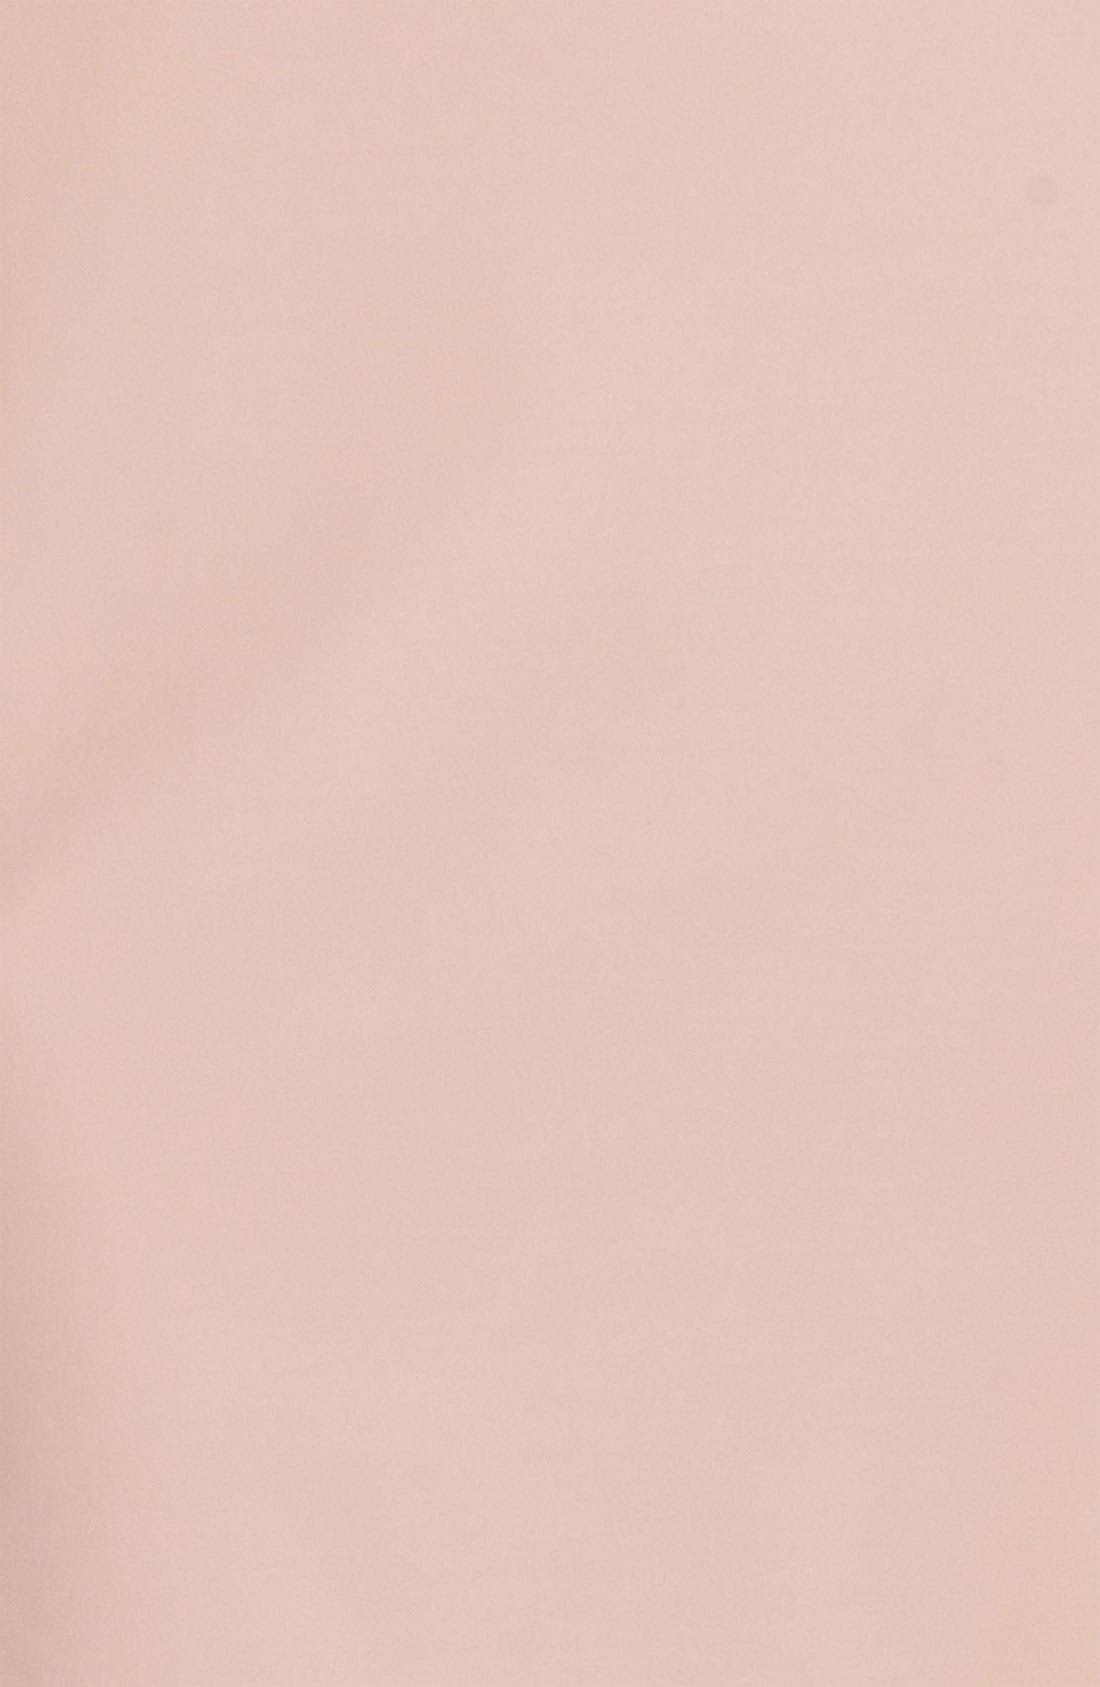 Strapless Slip,                             Main thumbnail 1, color,                             250